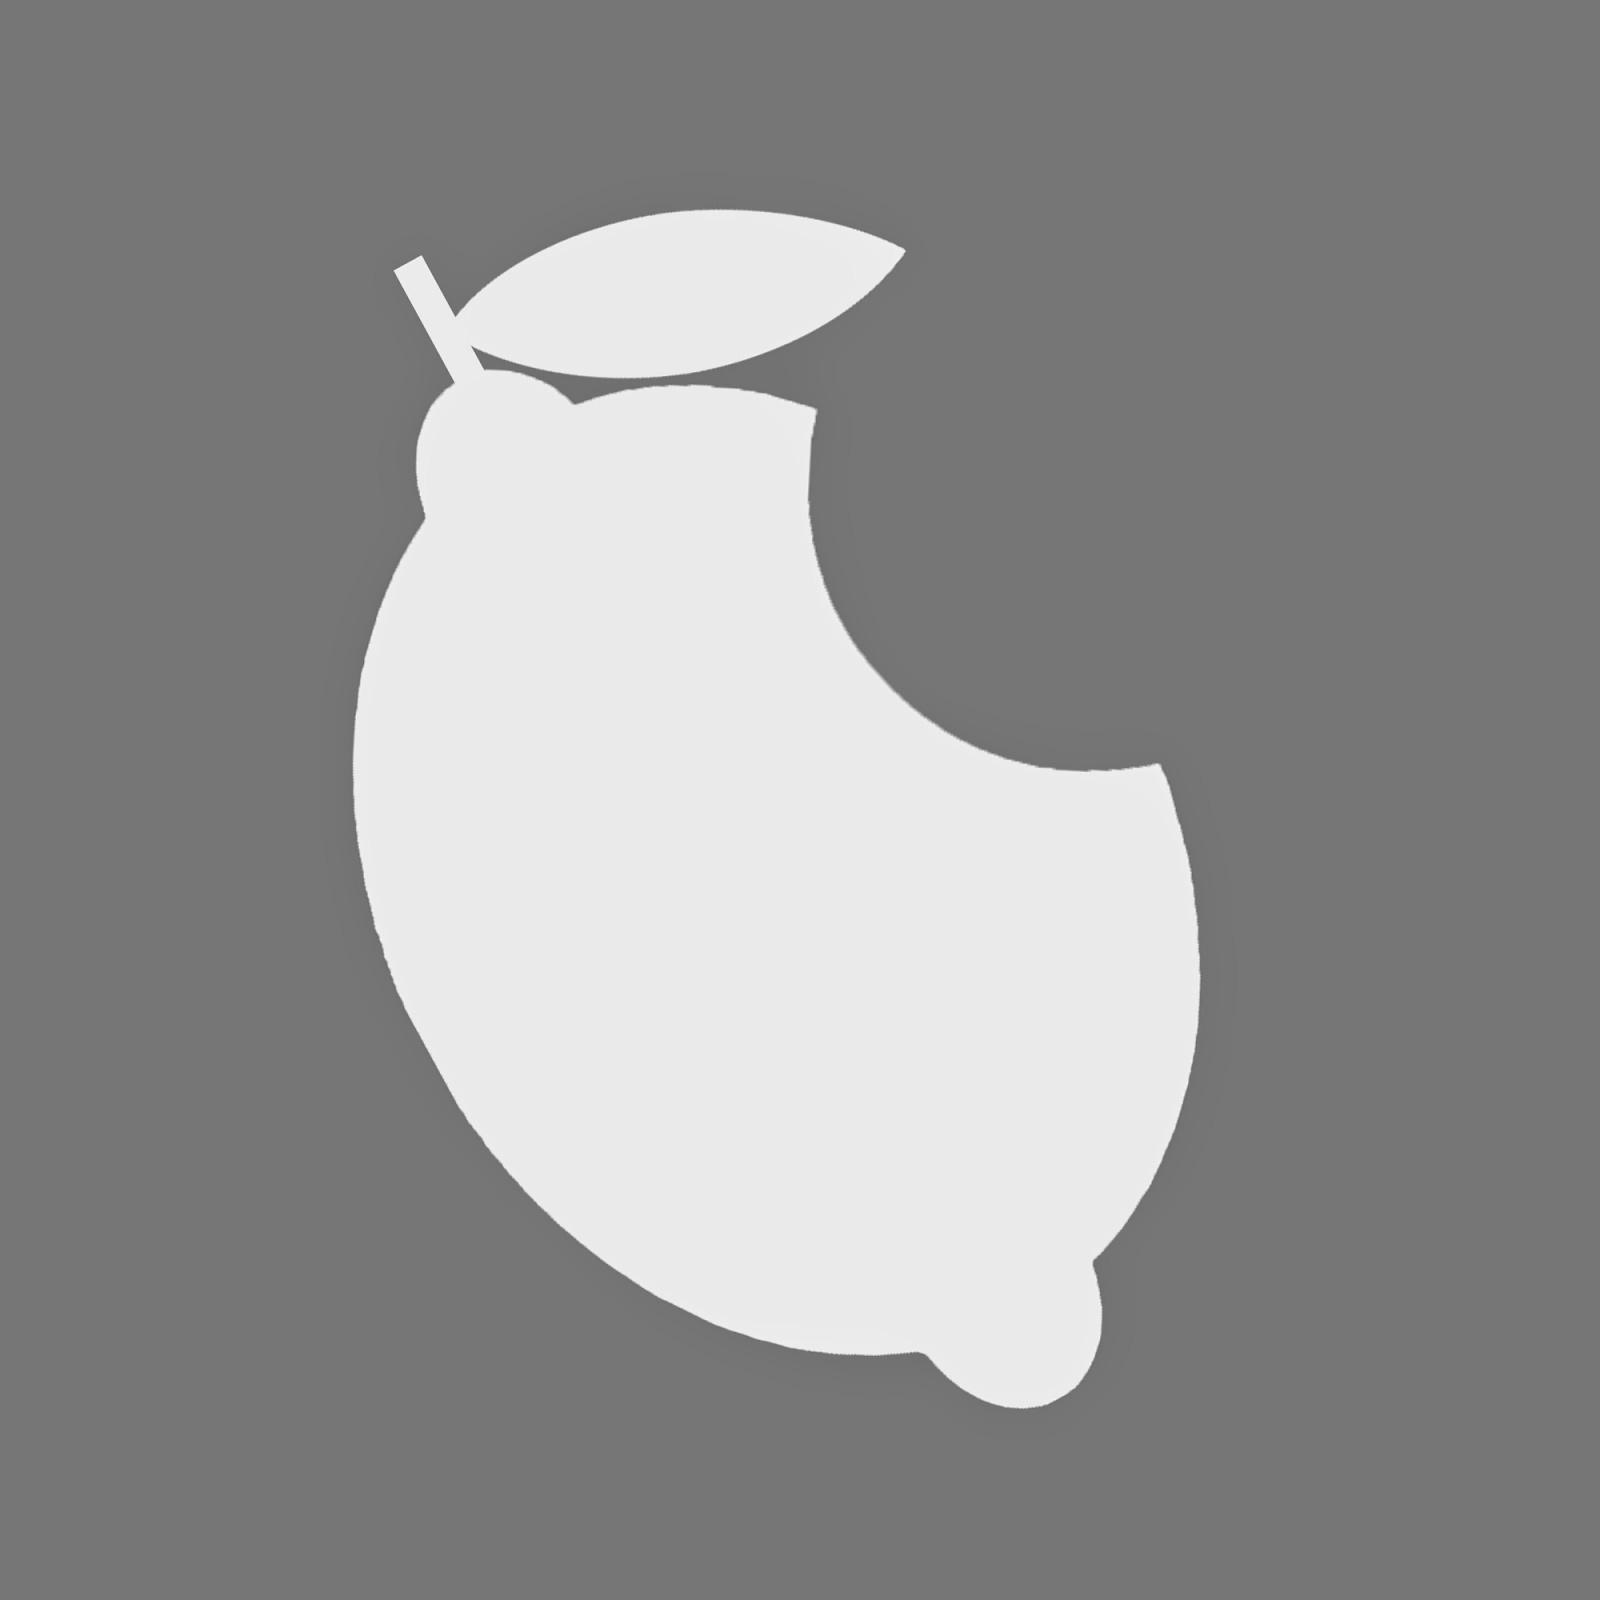 apple logo parody - lemon | soviet exxon